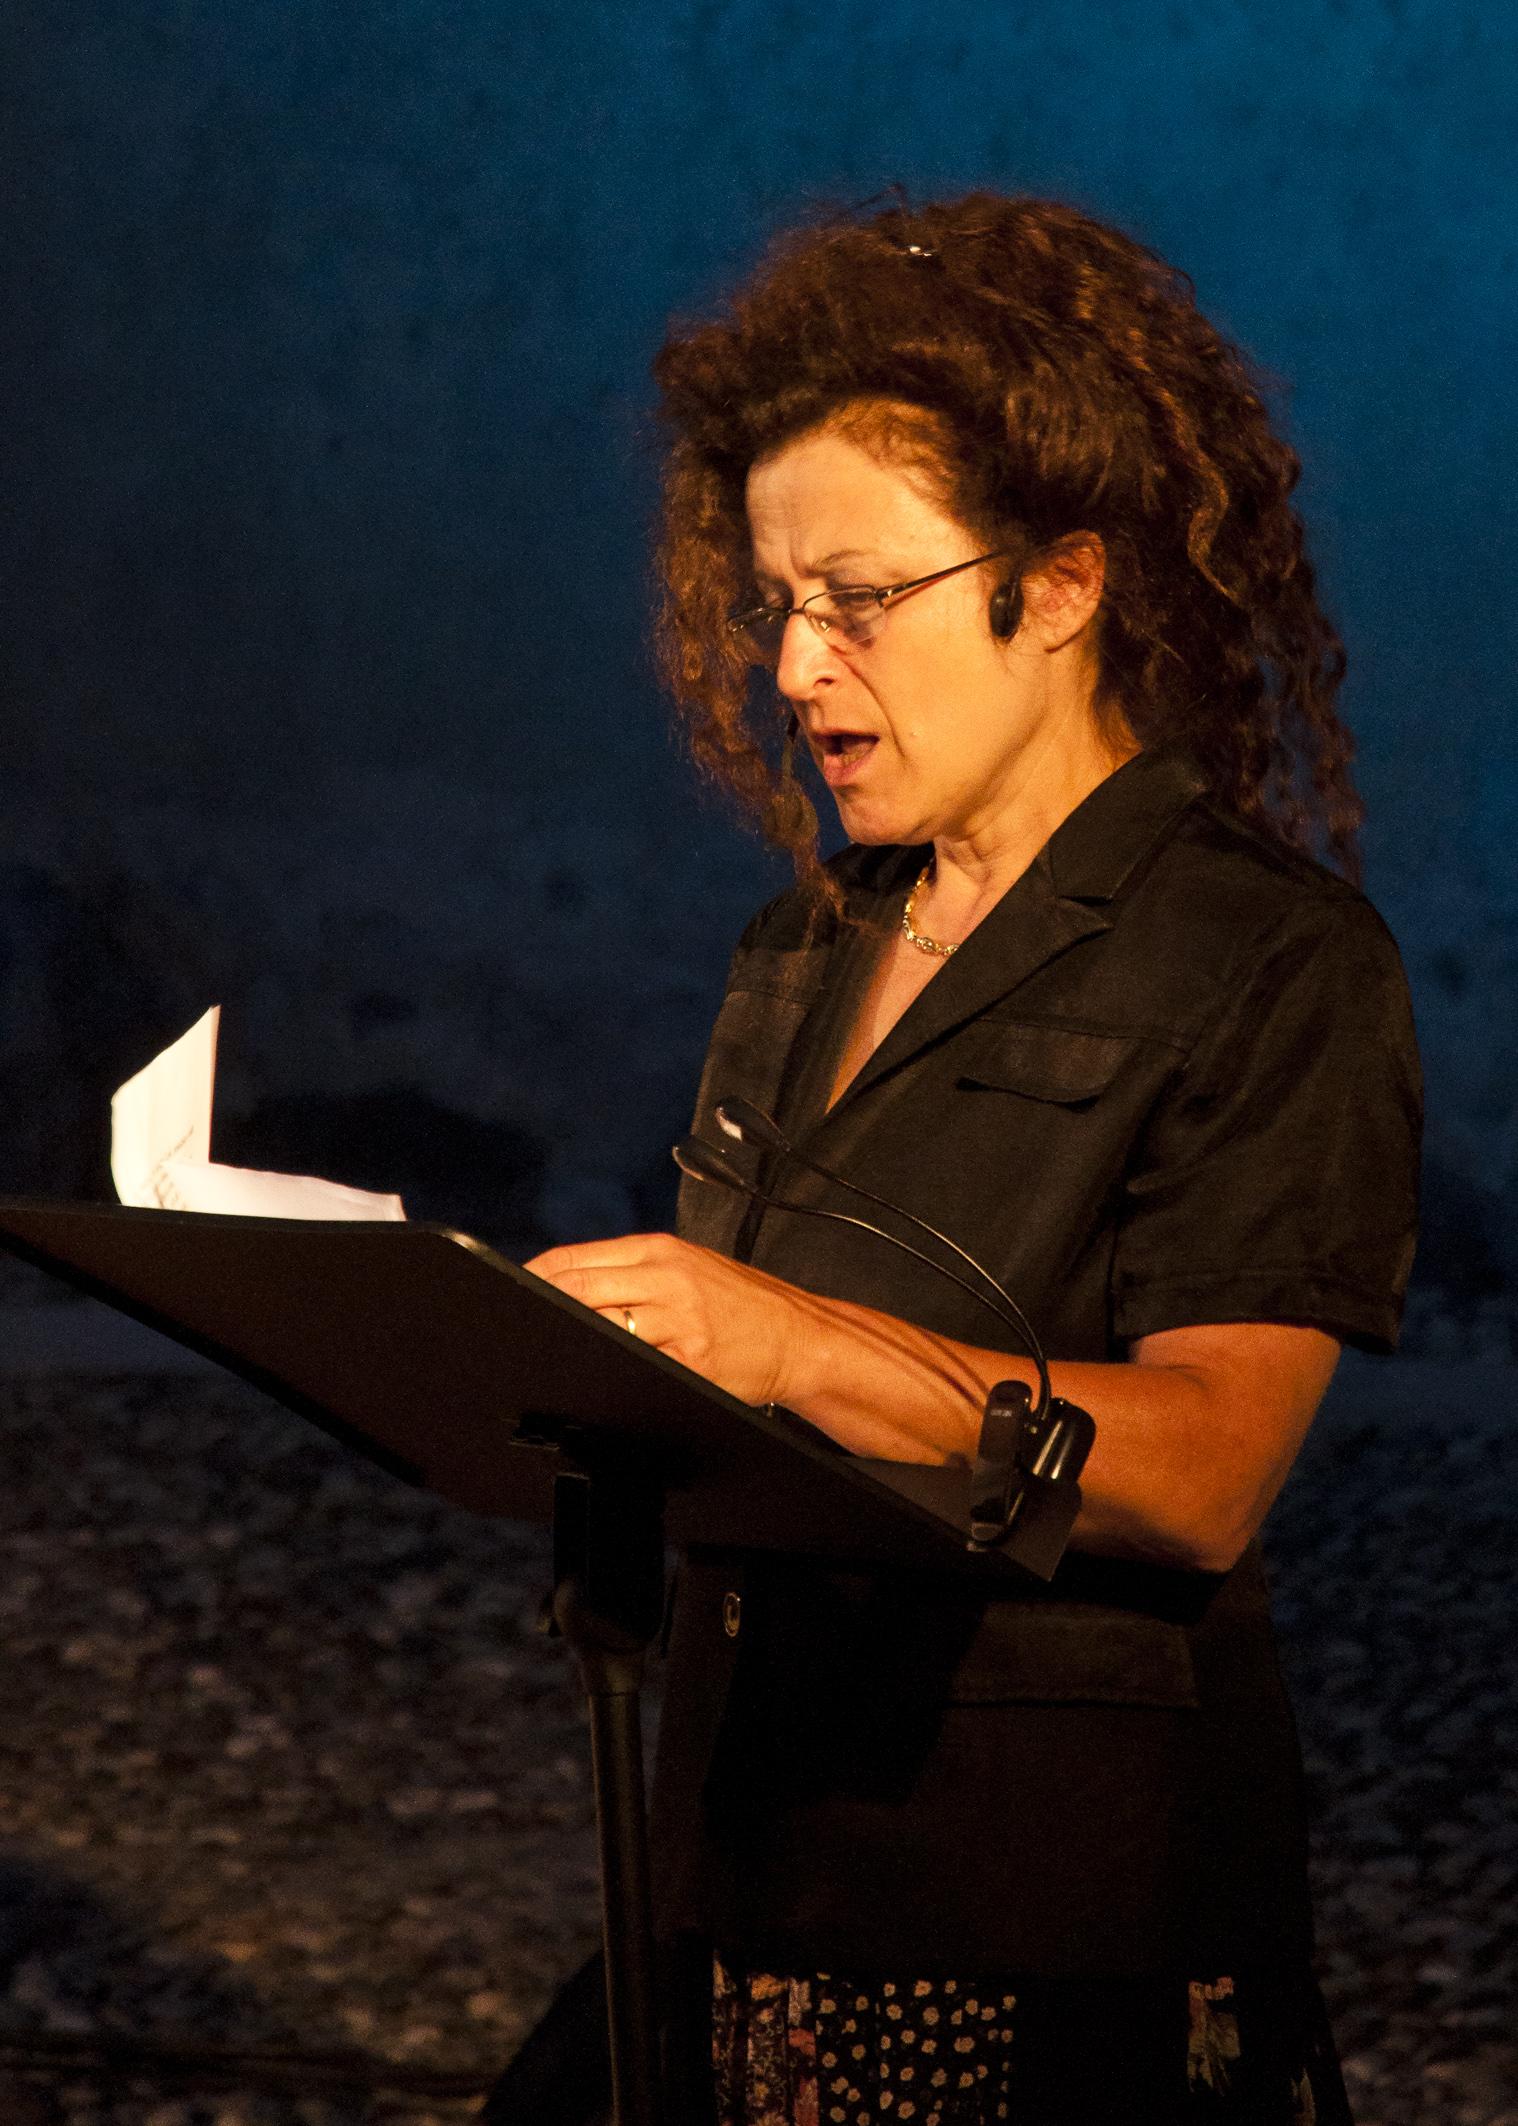 Carmela Bortolotti